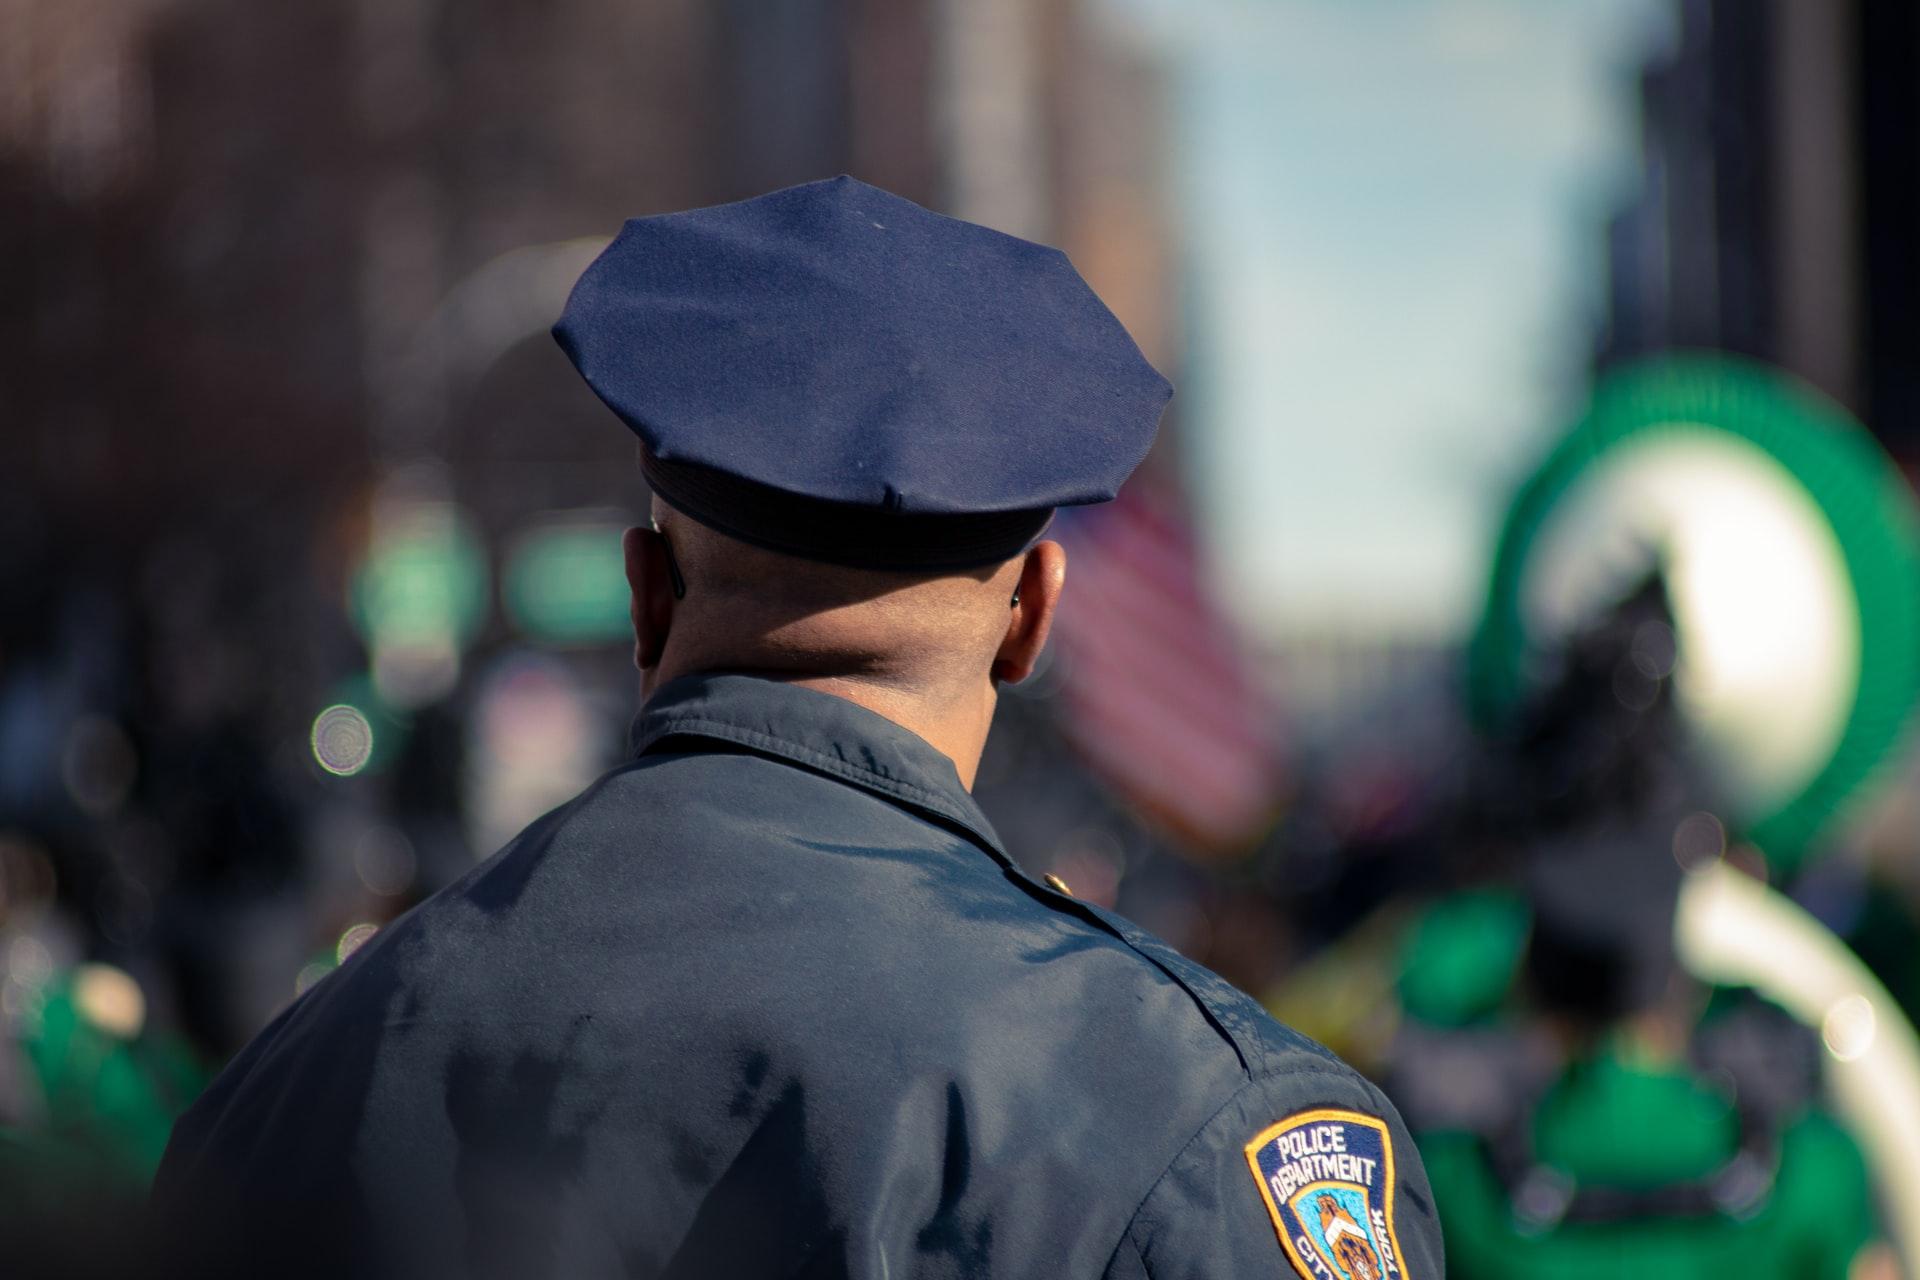 Photo of a Black police offifer